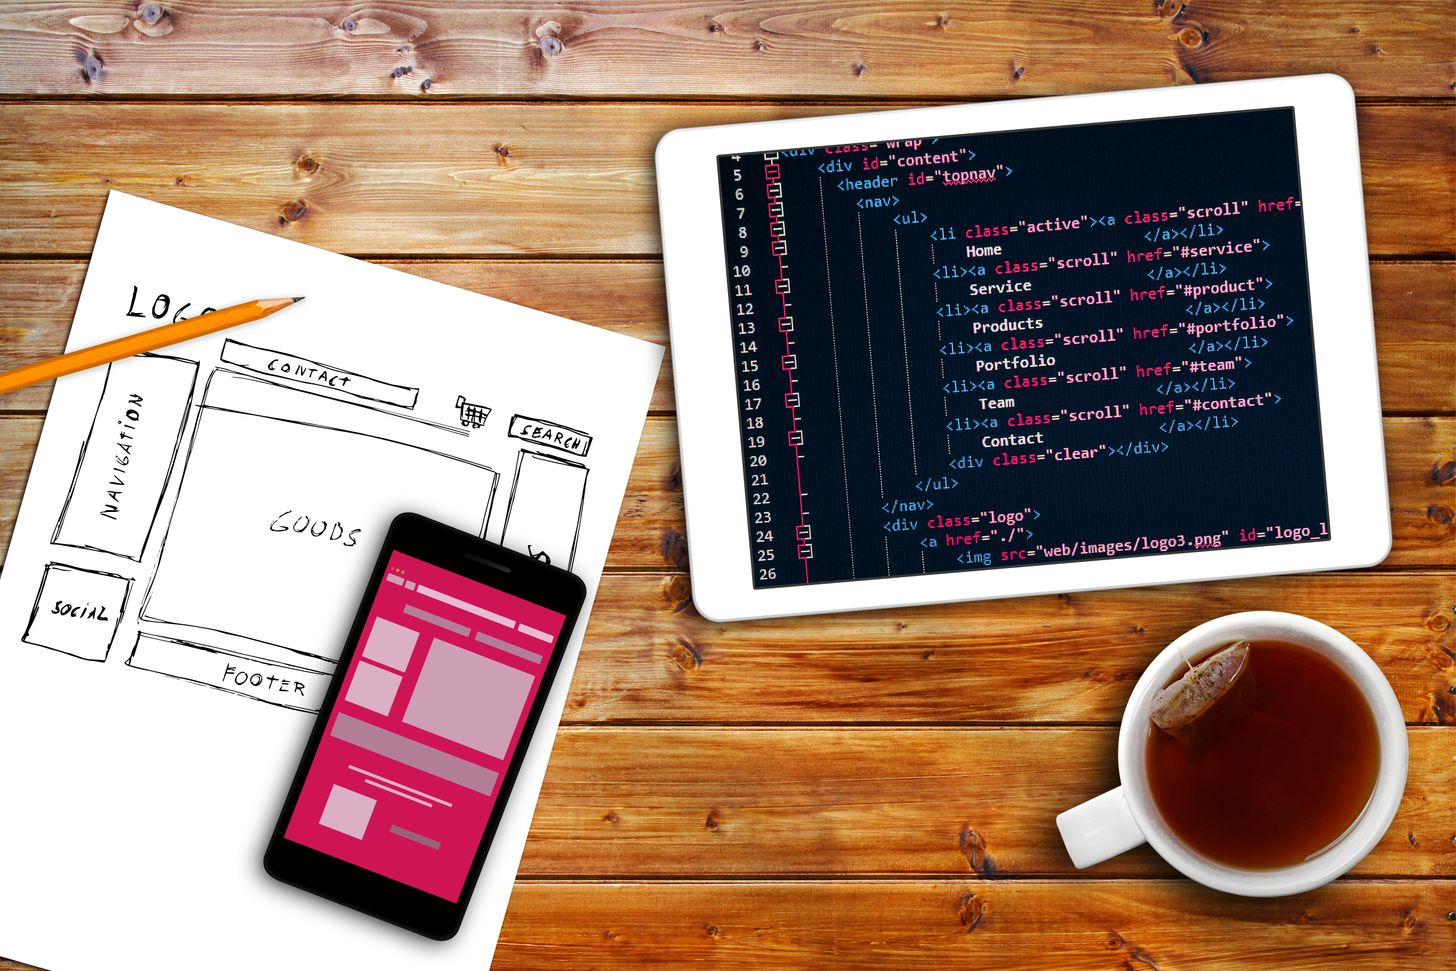 website wireframe sketch and code.jpg